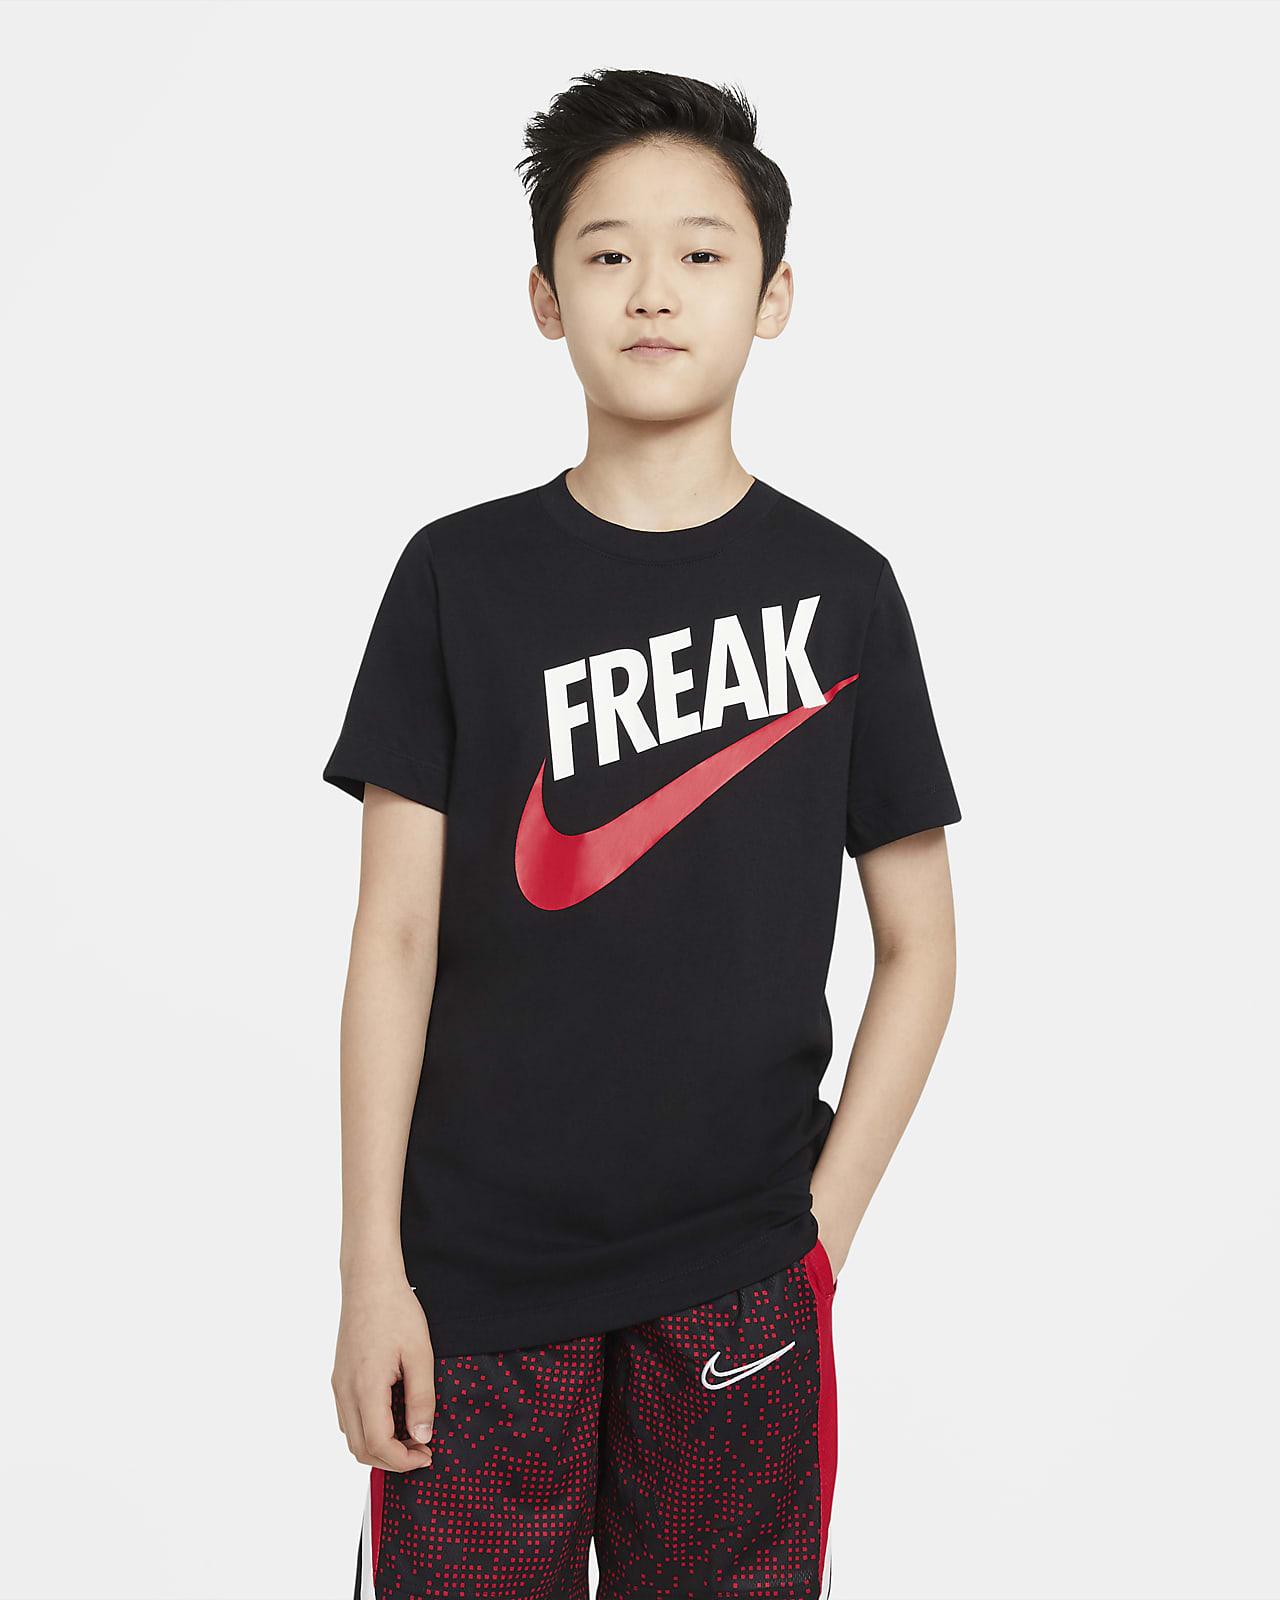 T-shirt Nike Dri-FIT Giannis Júnior (Rapaz)